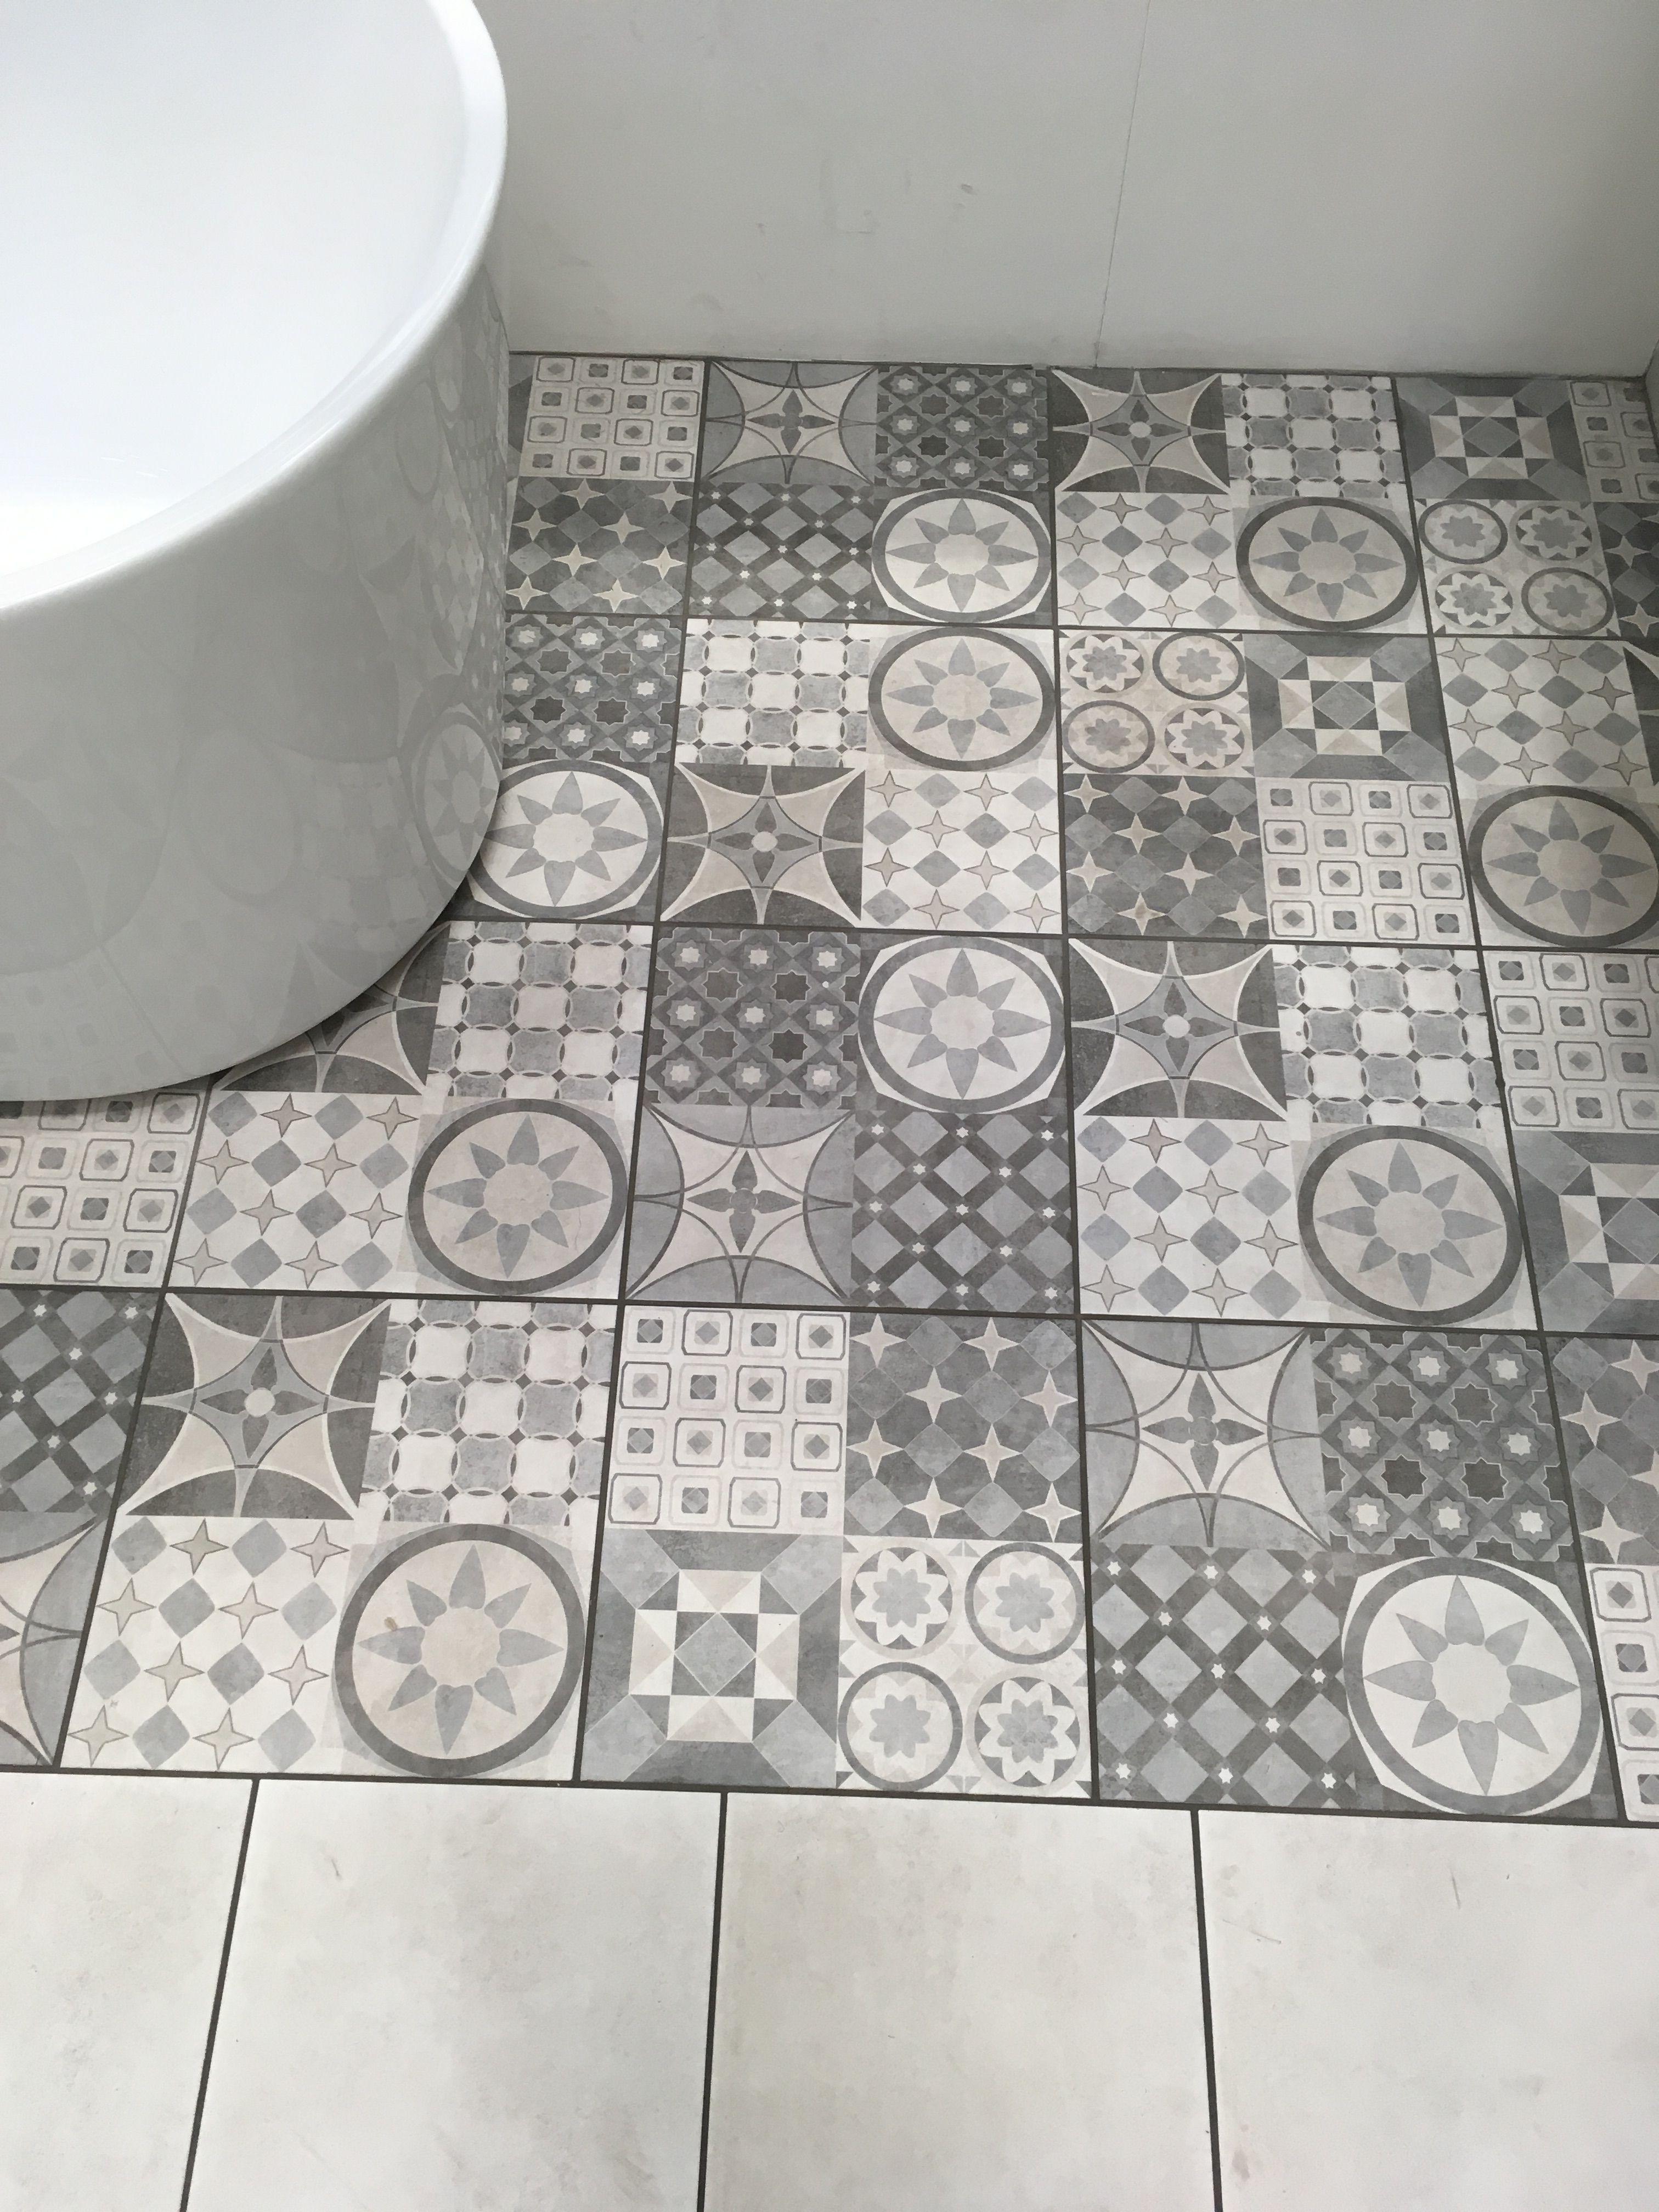 Bathroom Floor Tiles B Amp Q Kitchendesignb Amp Q Kitchen Makeover In With Images Bathroom Floor Tiles Tile Bathroom Bathroom Wall Tile